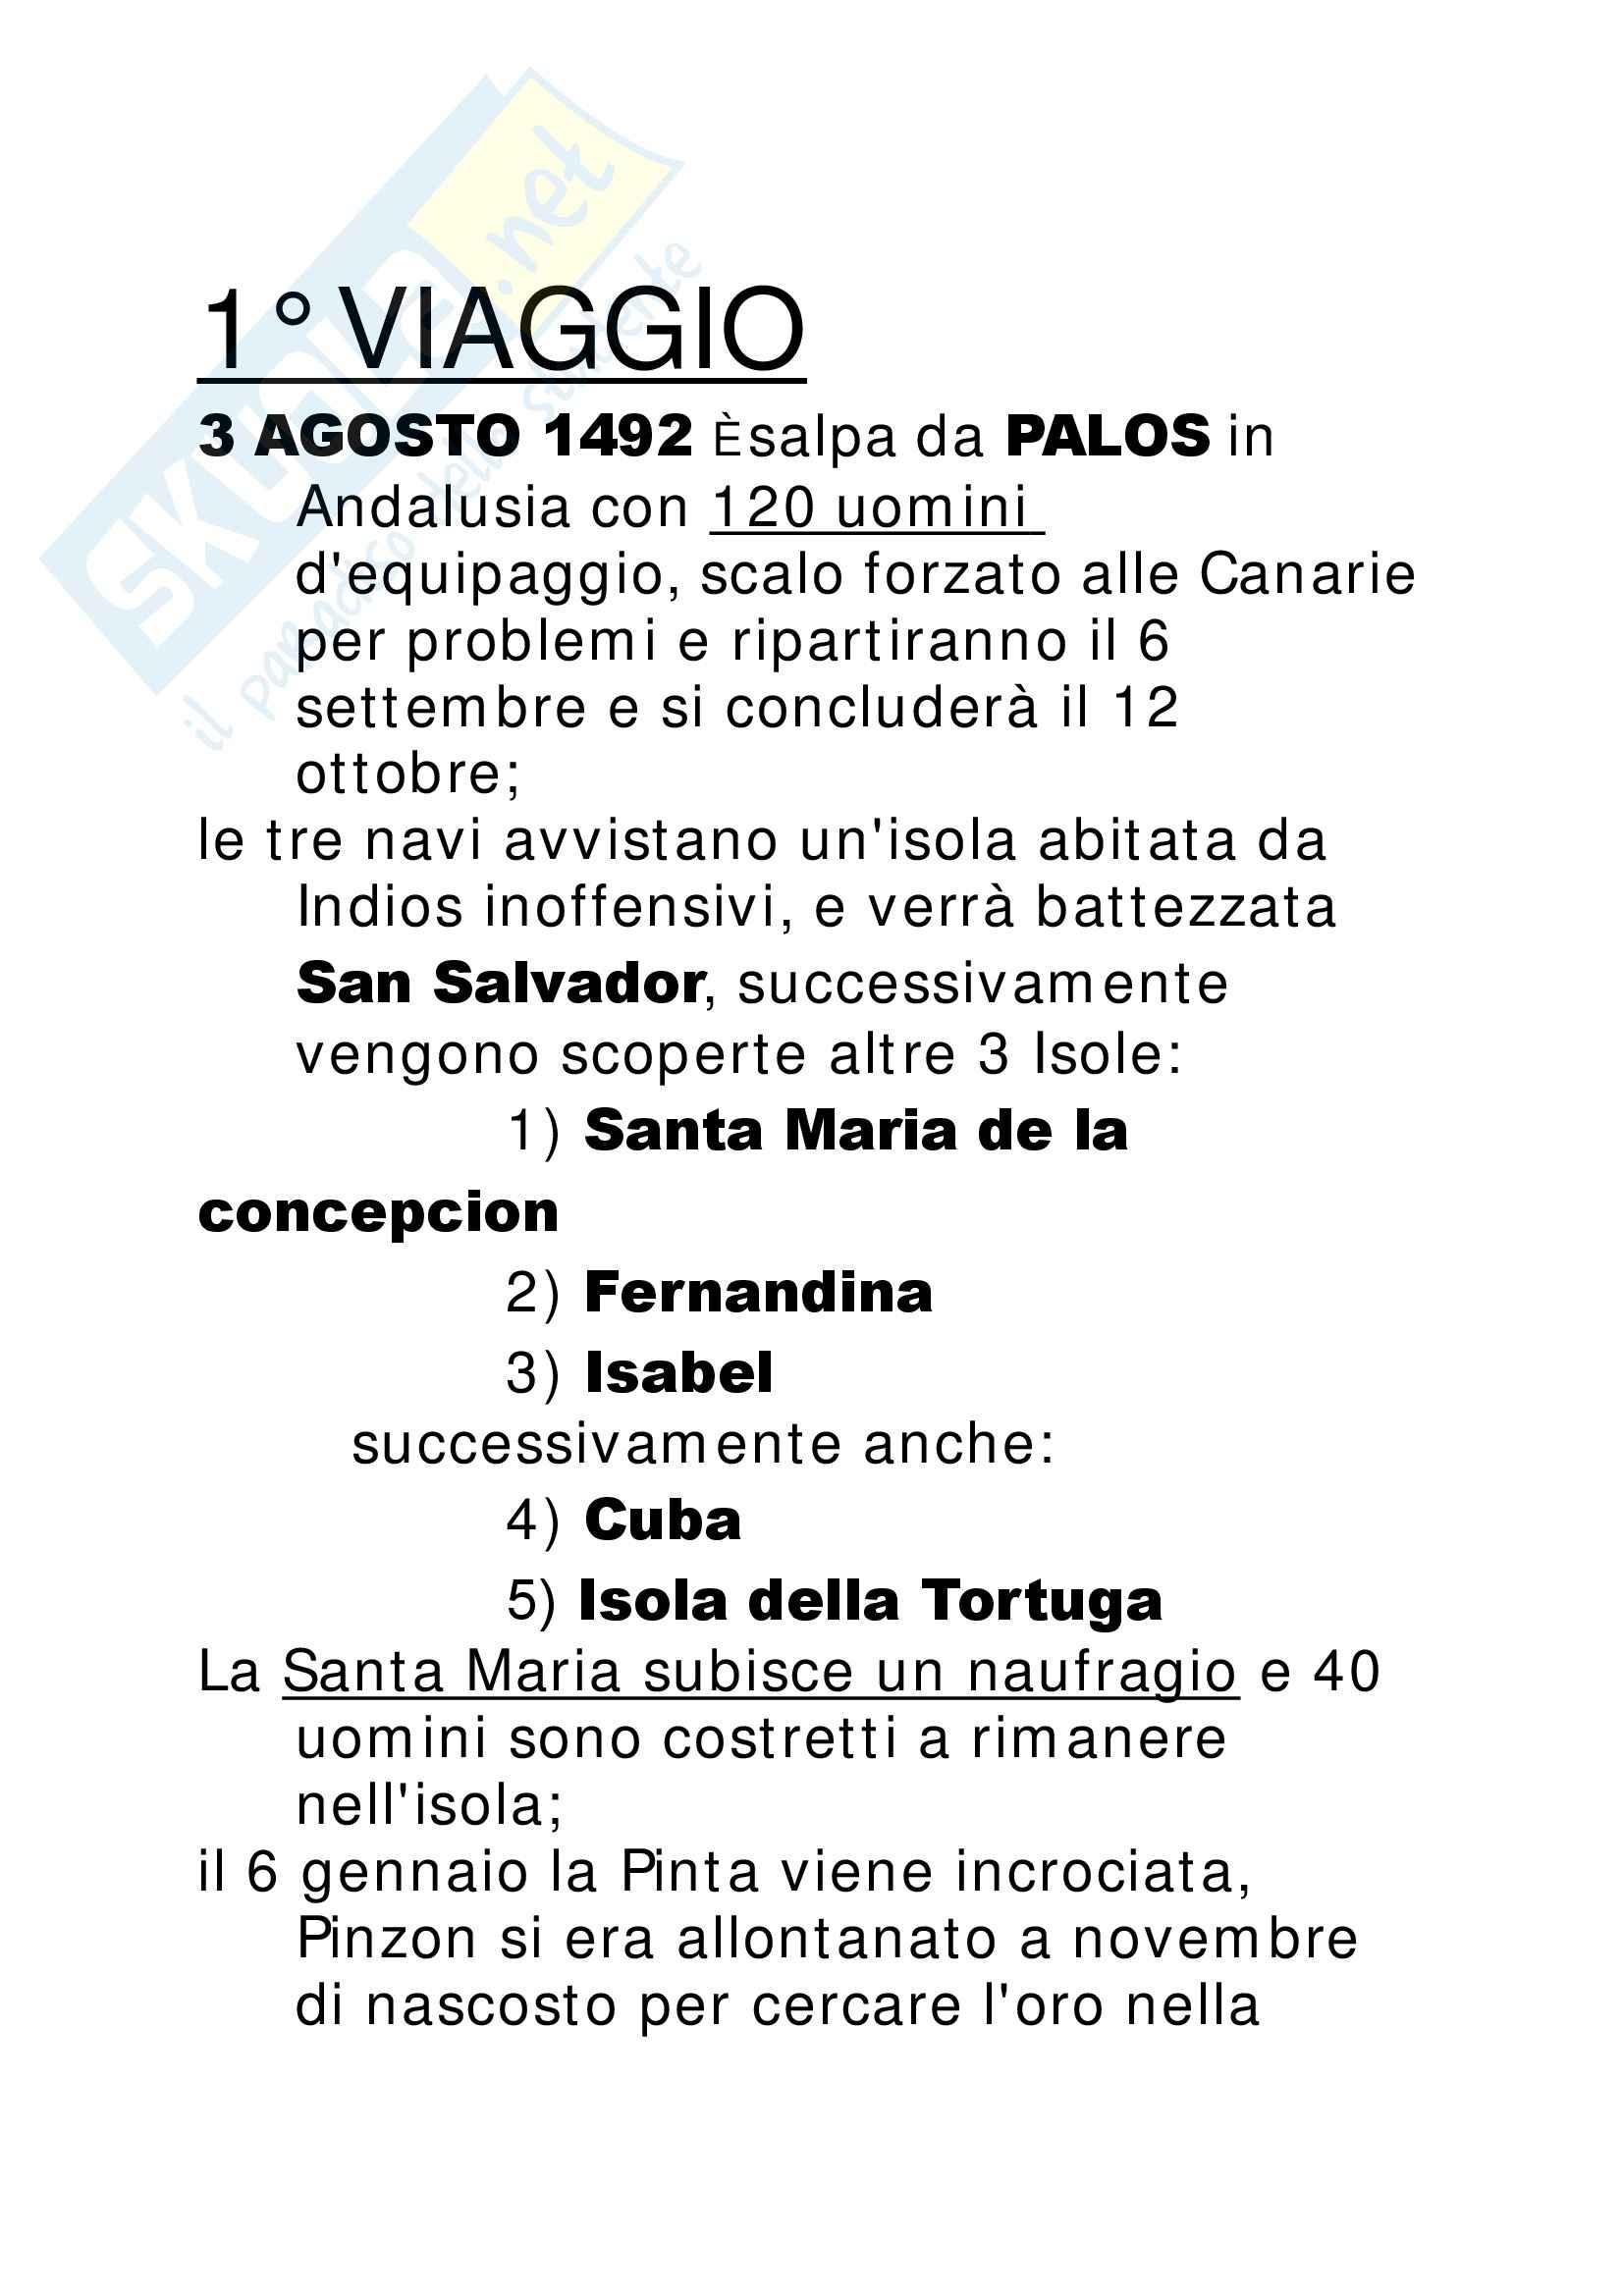 Cristoforo Colombo - Appunti Pag. 2